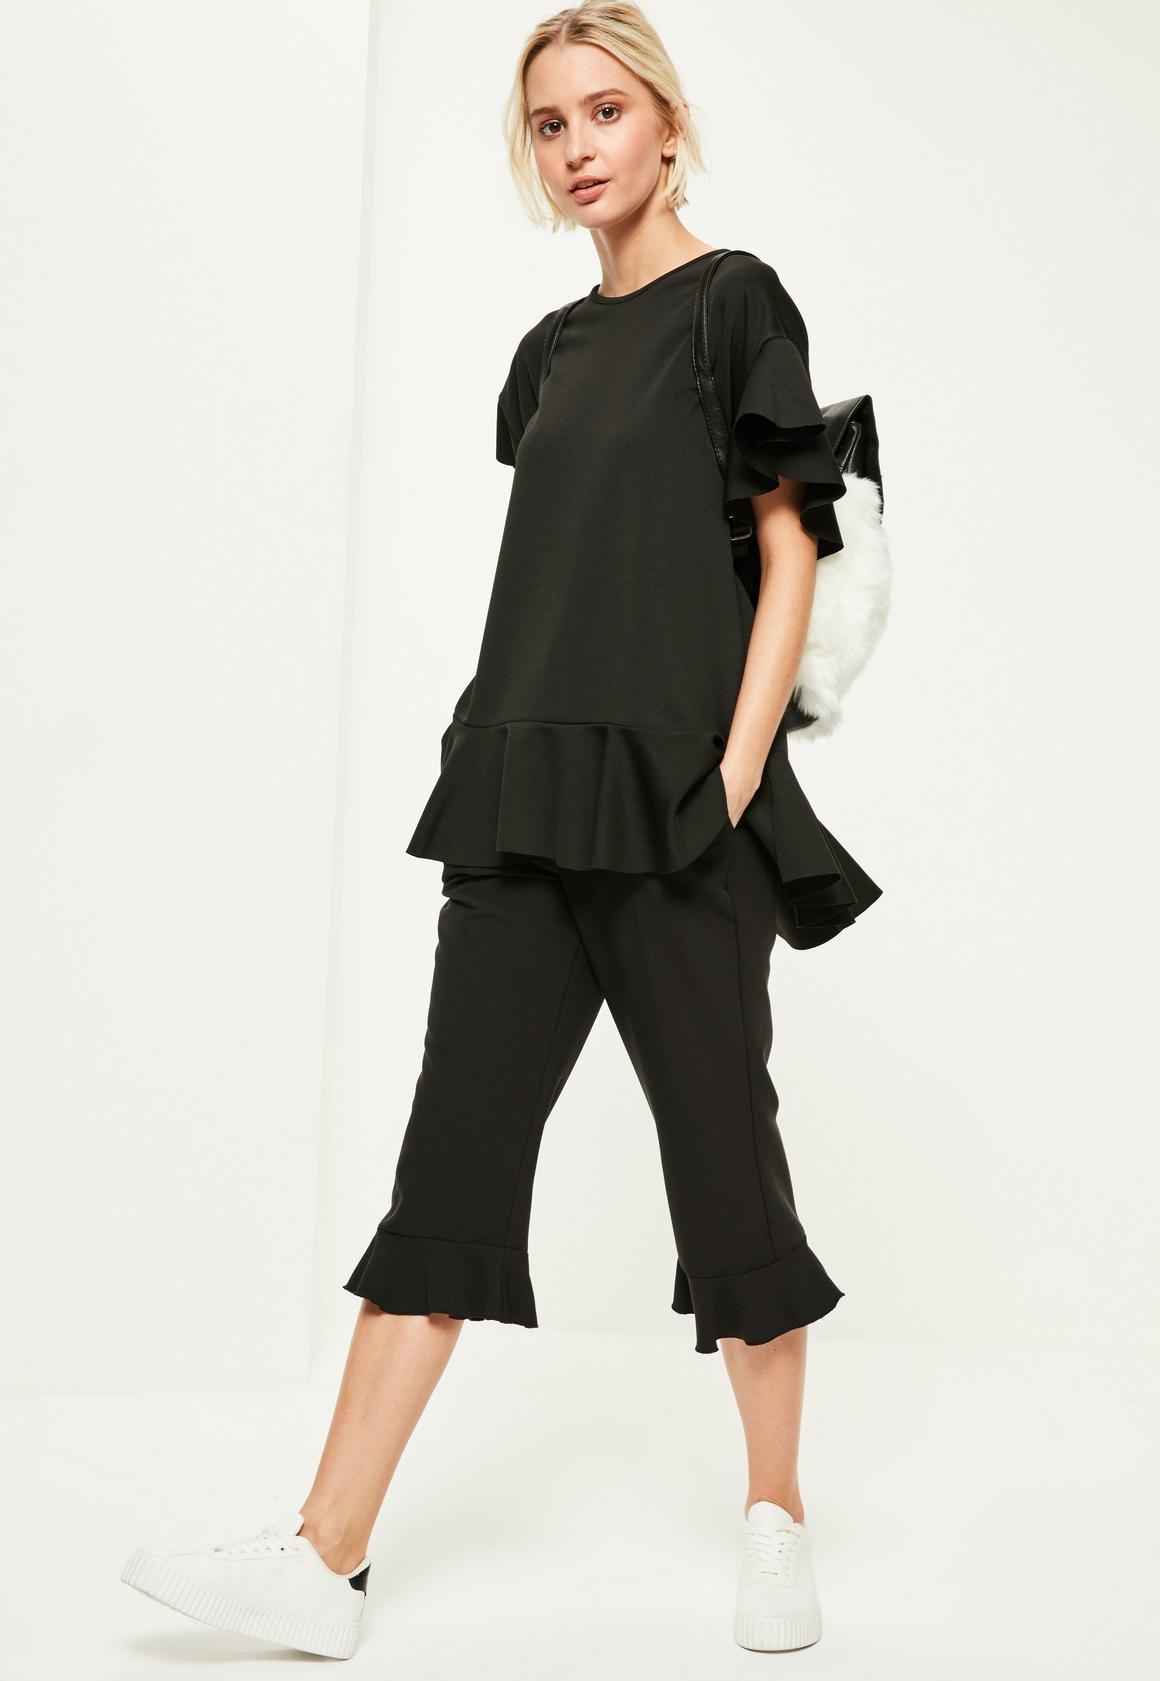 Oversized black t shirt - Black Oversized Peplum Frill T Shirt